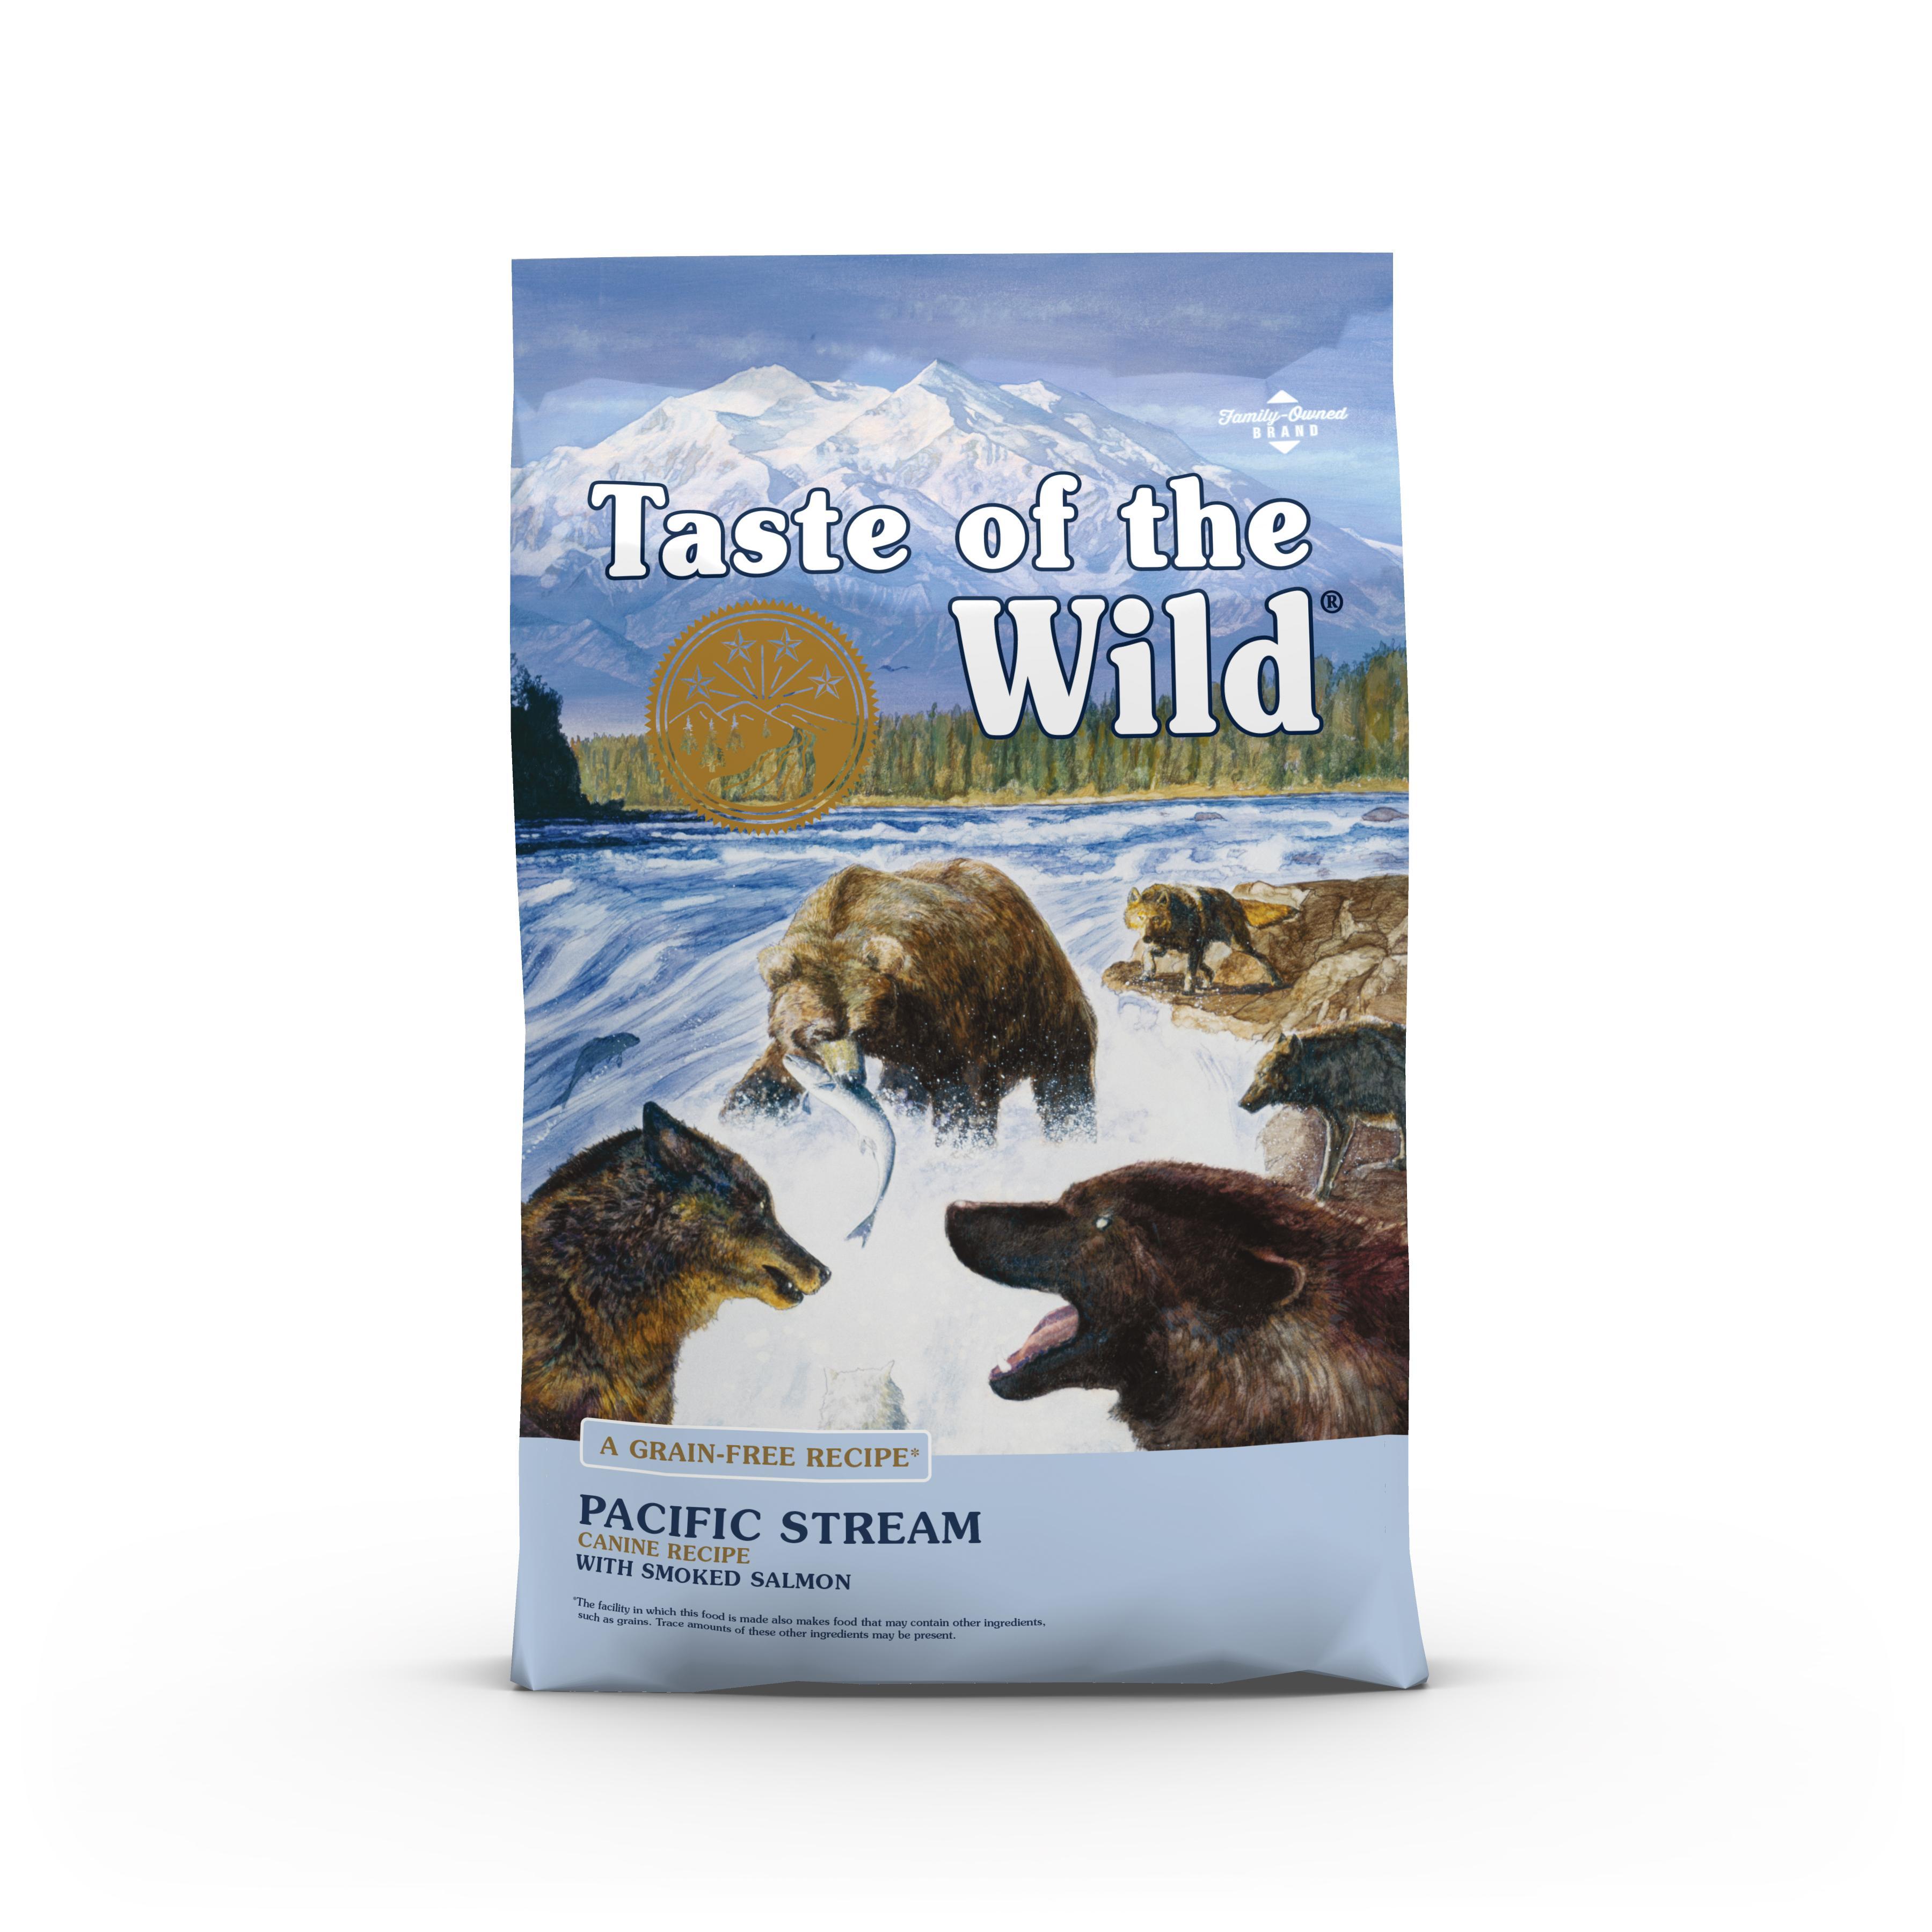 Taste of the Wild Pacific Stream Grain-Free Dry Dog Food, 14-lb